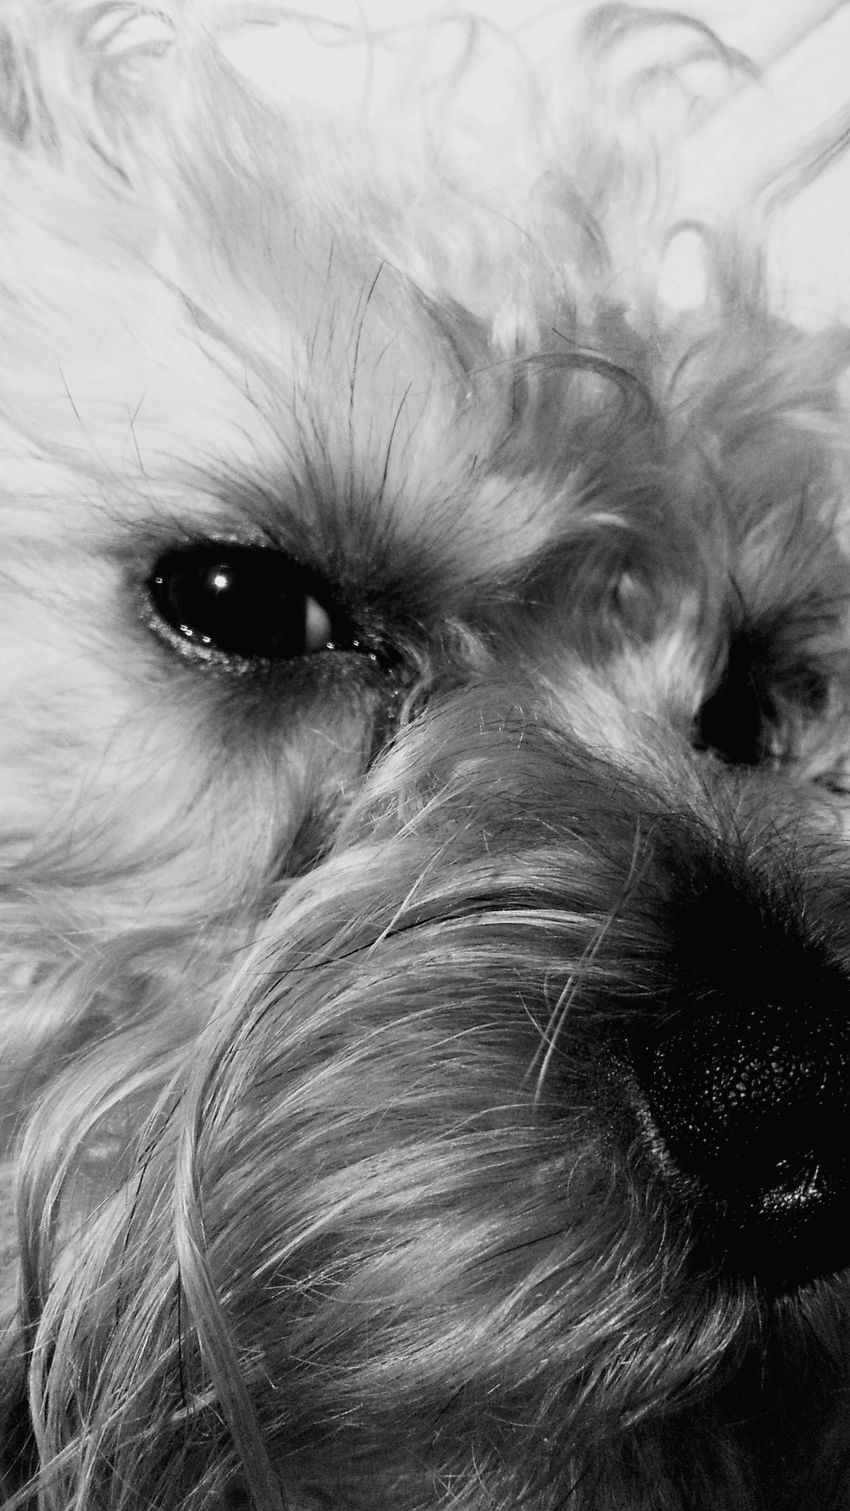 Mychewbacca Star Wars Mismydog